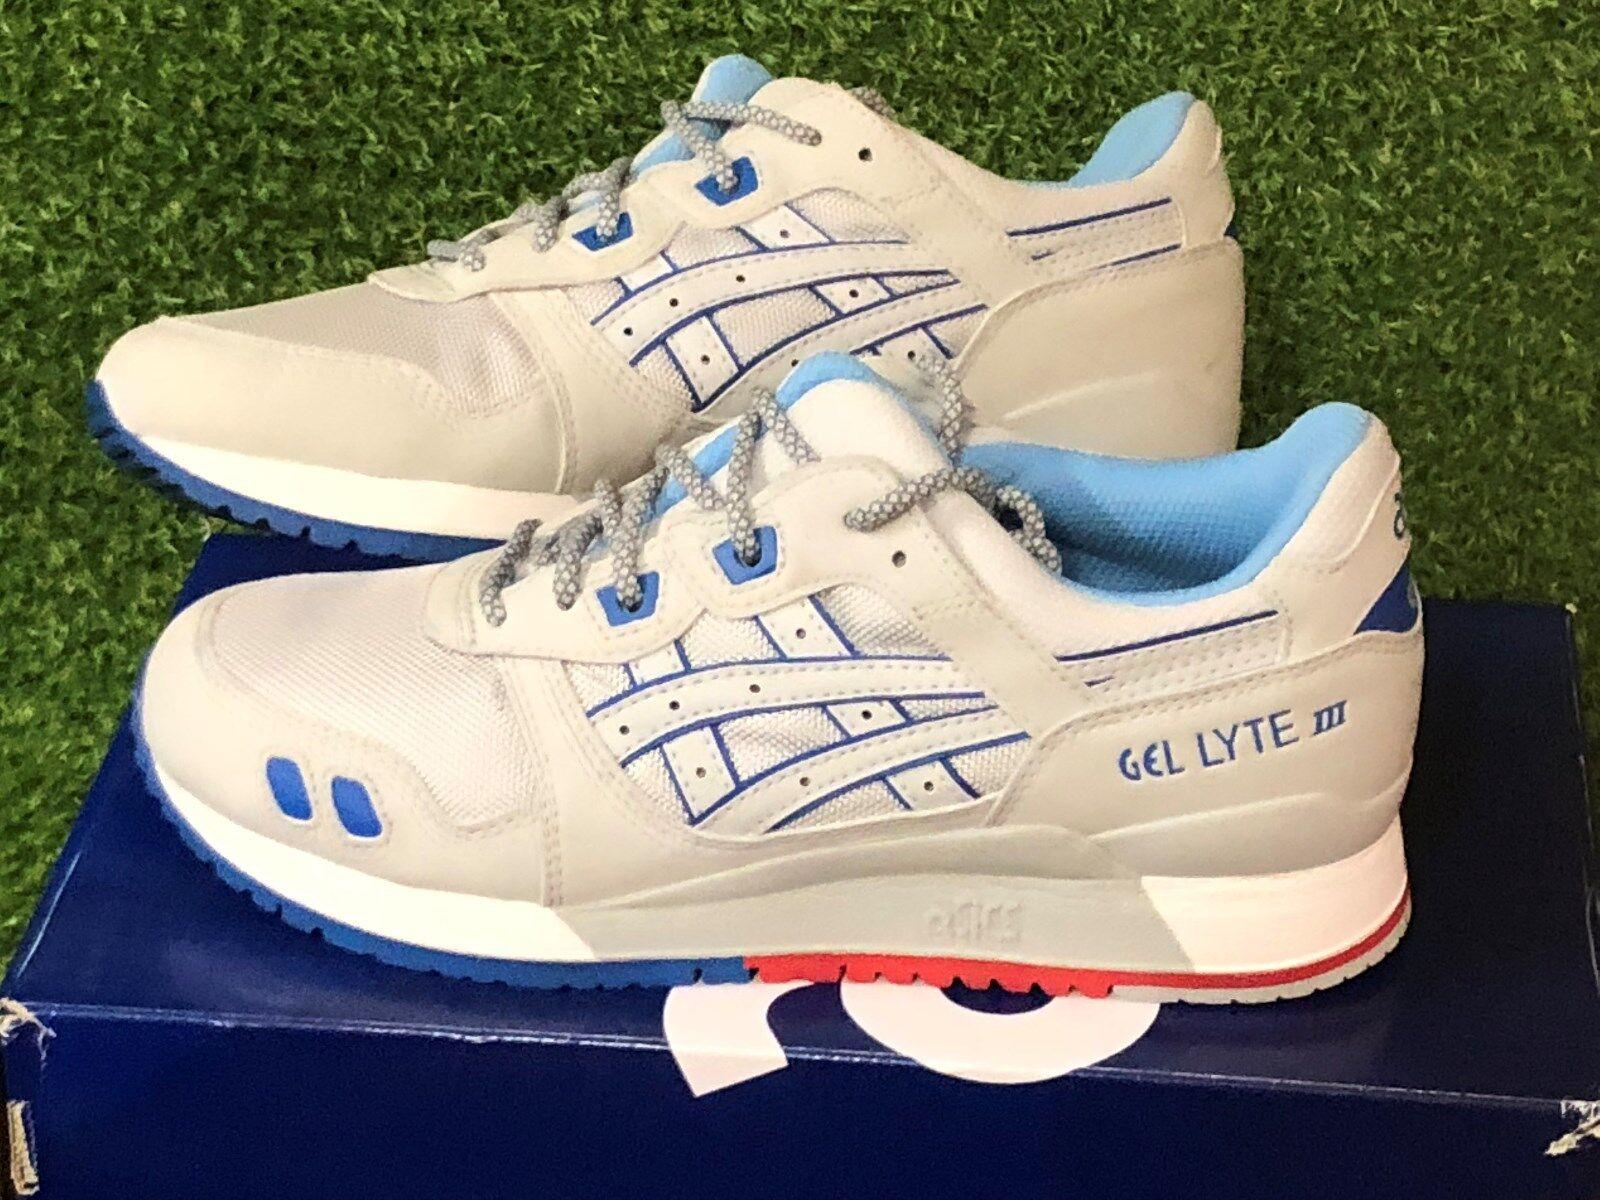 Asics Gel Lyte III Baskets Chaussures  taille choisir Nouveau neuf dans sa boîte